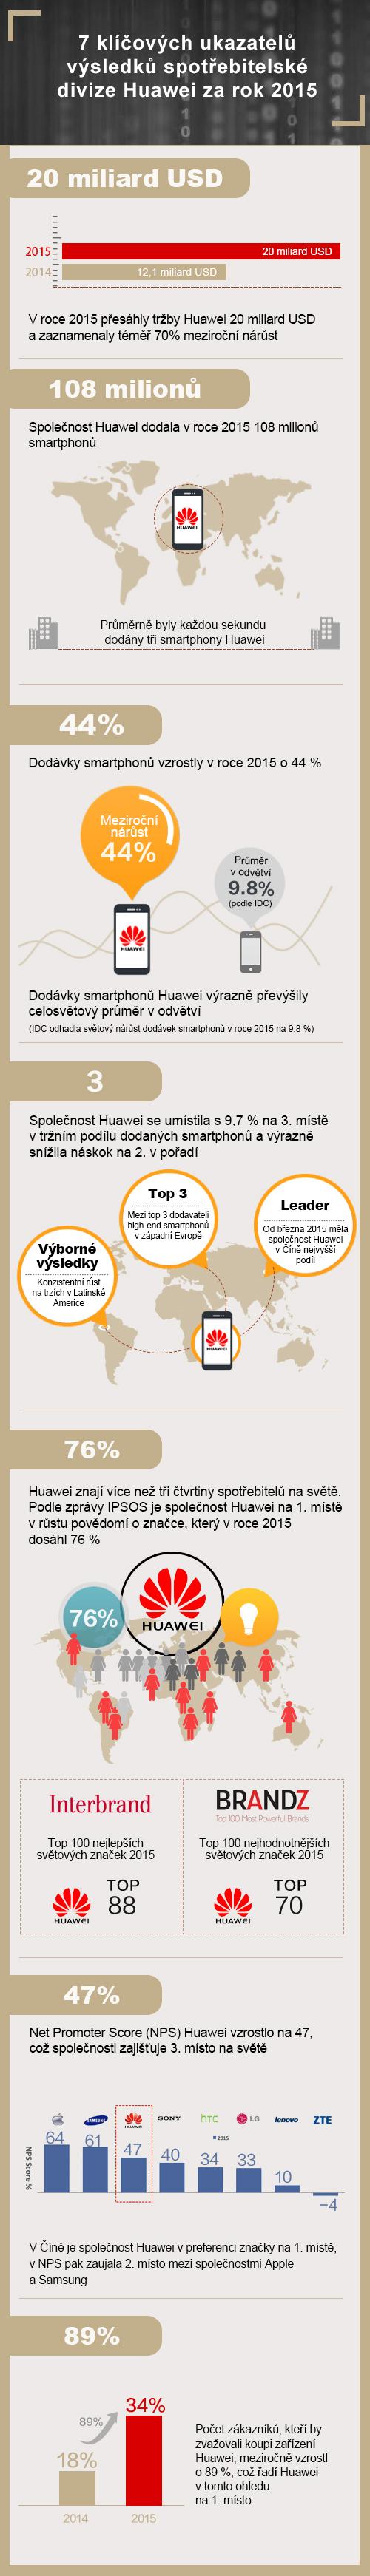 Huawei-infografika_2015-CZ